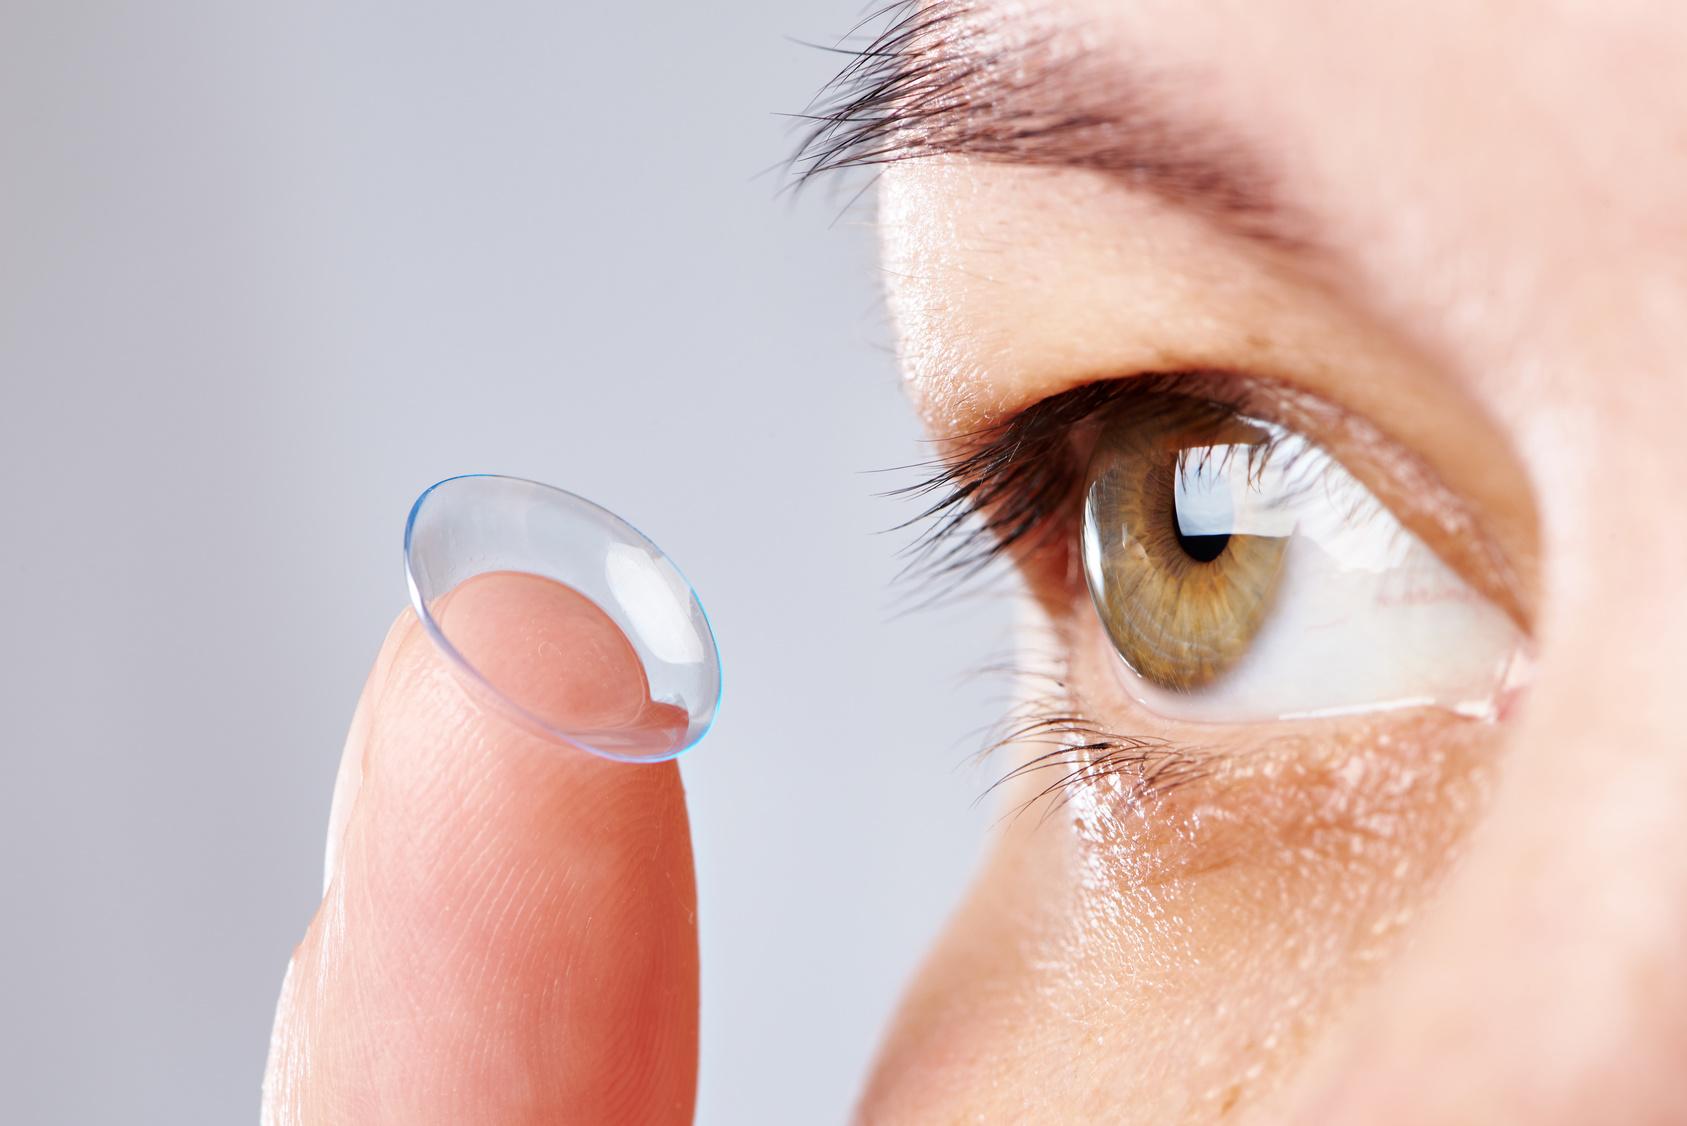 kontaktlinsen rausnehmen